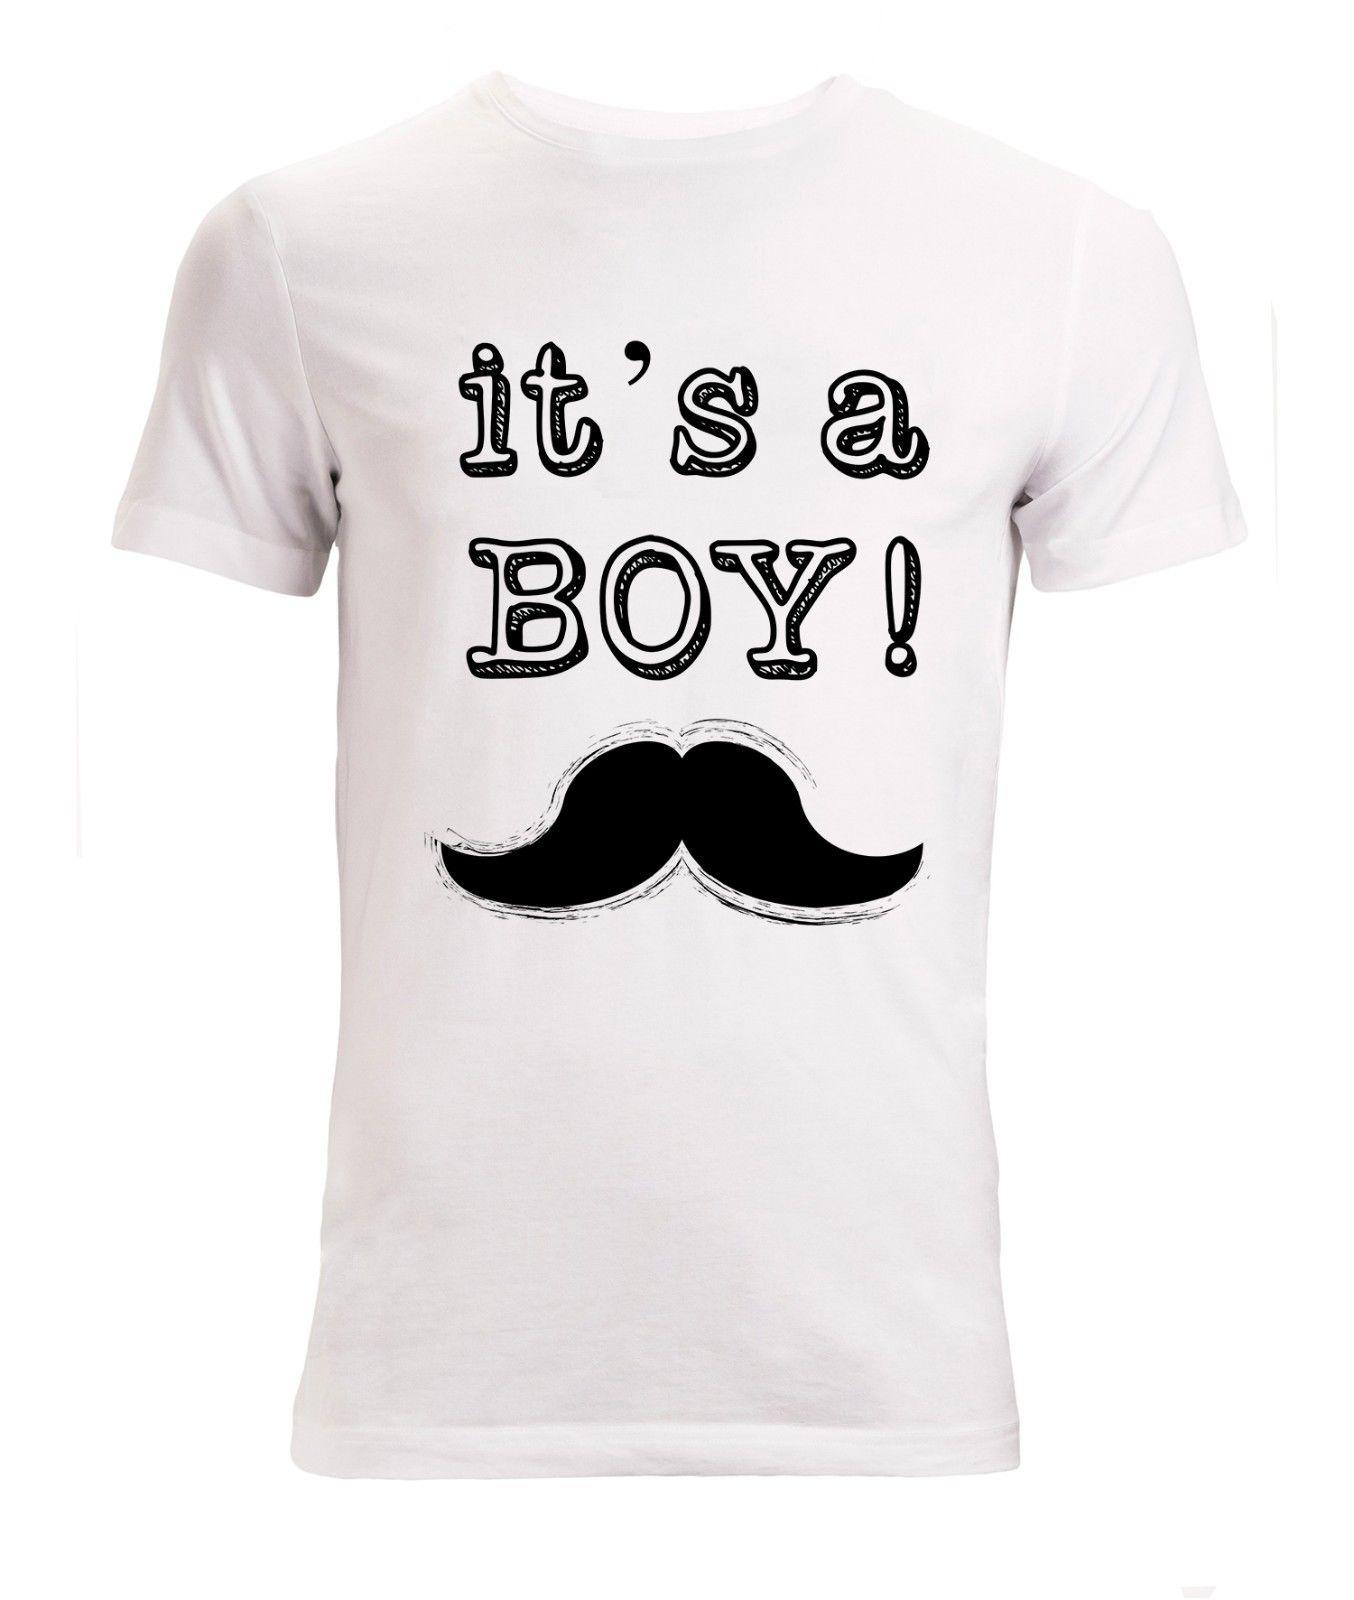 "Men/'s Sweatshirt Light Sweater White /"" Madonna Moustache /"" Road to Happiness"